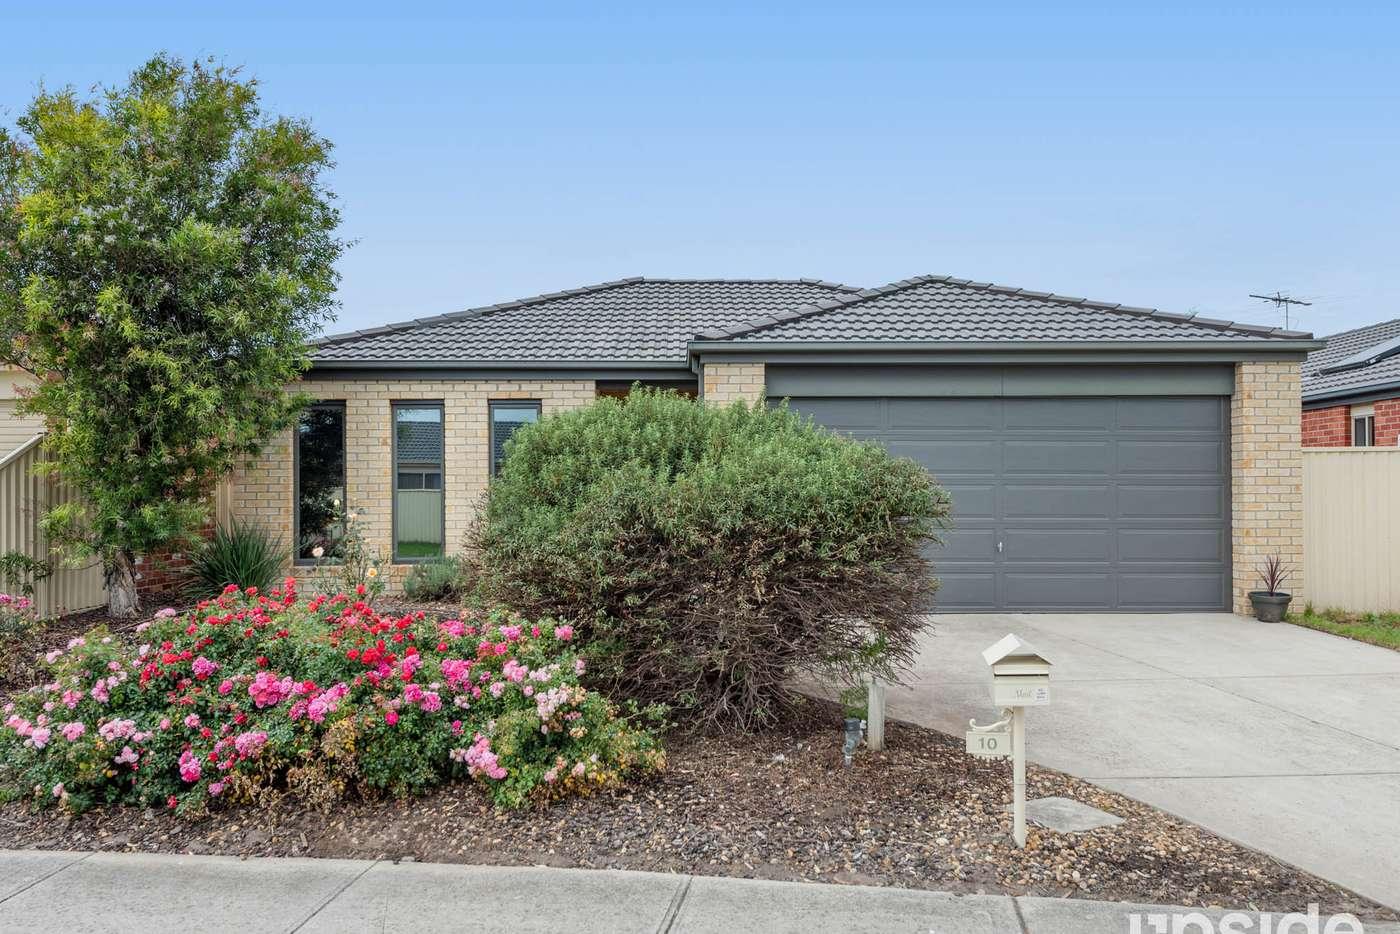 Main view of Homely house listing, 10 Nepeta Way, Pakenham VIC 3810